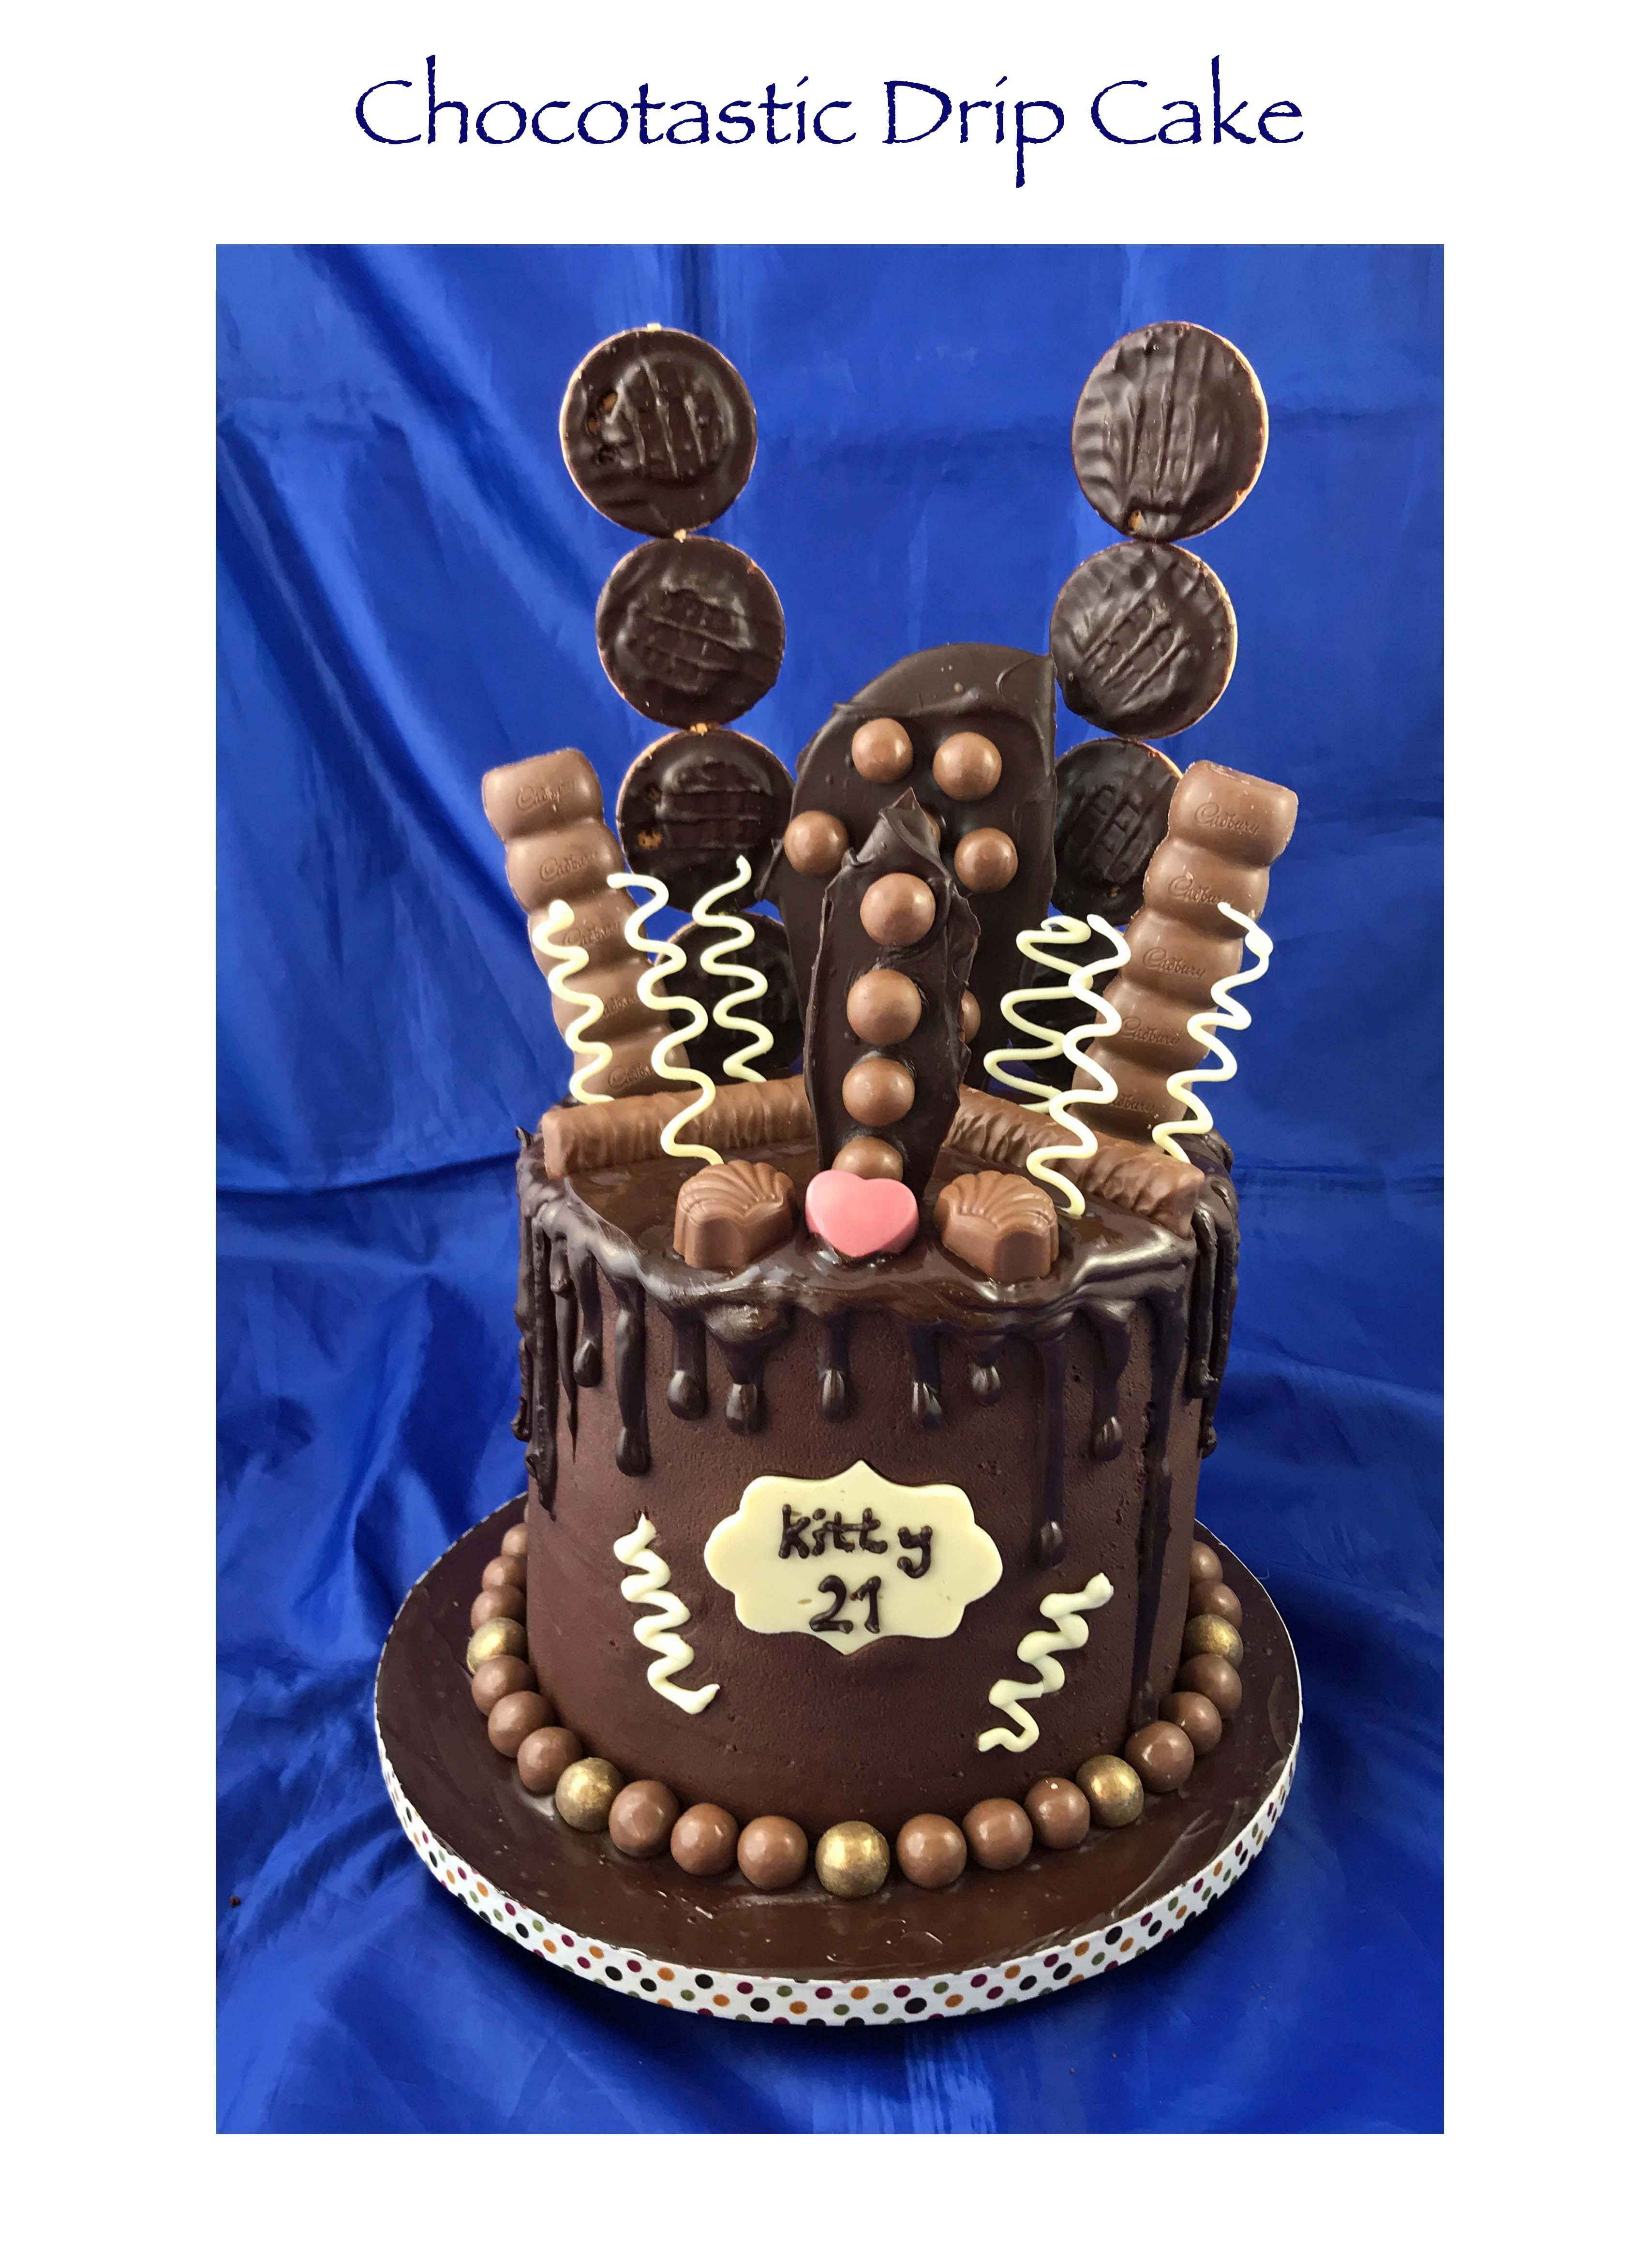 Chocotastic Drip Cake